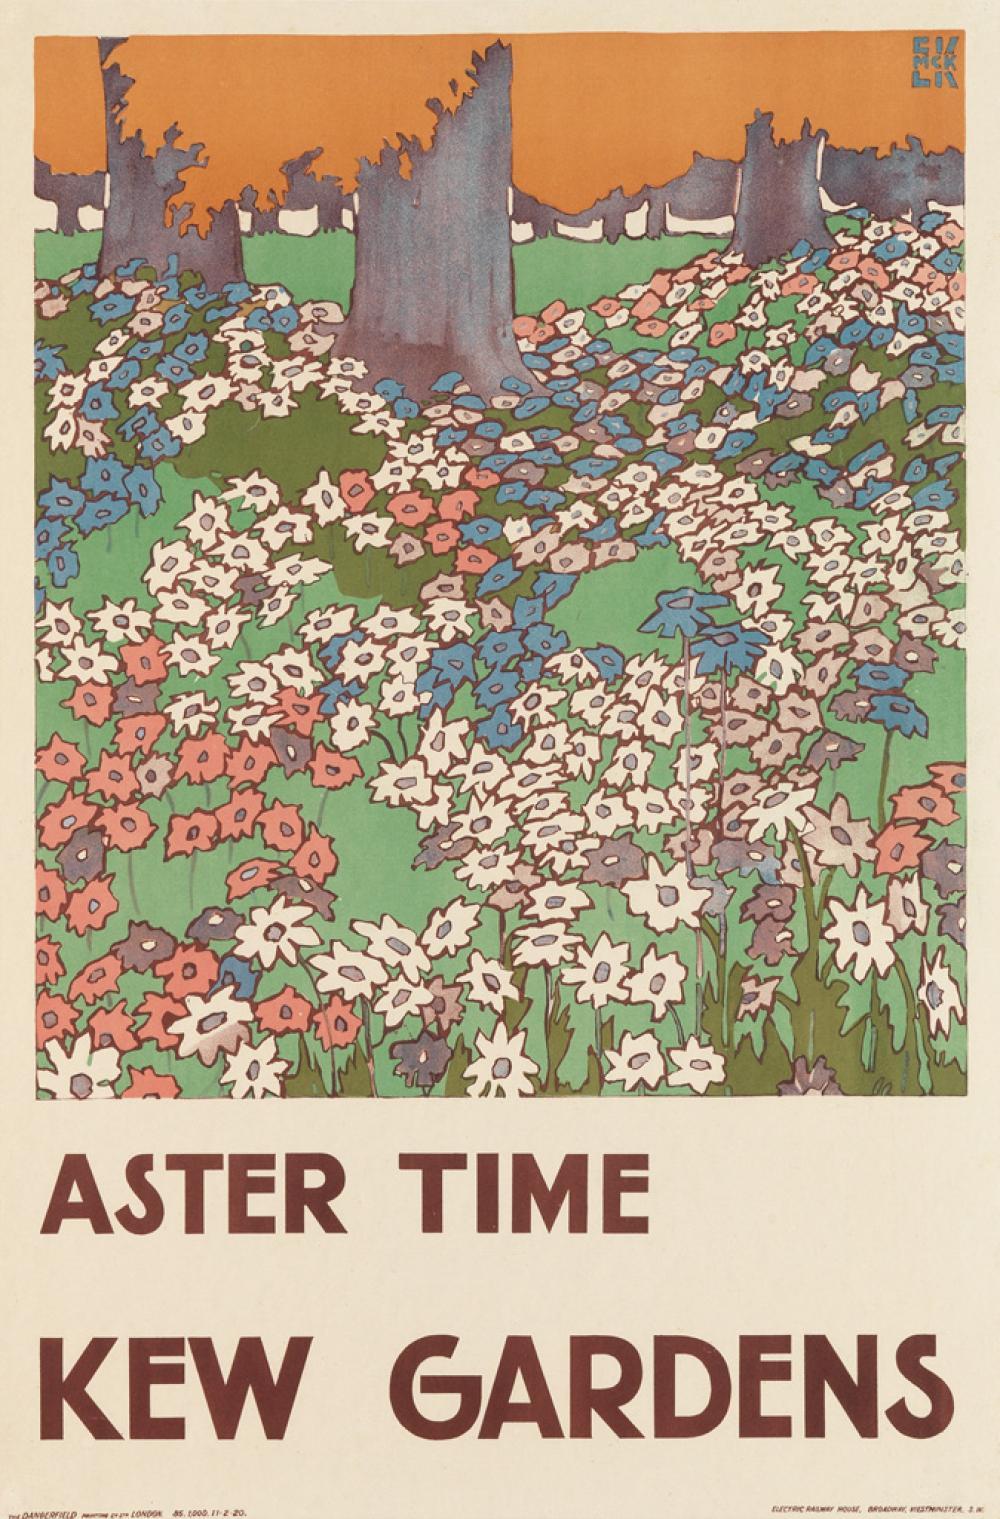 EDWARD MCKNIGHT KAUFFER (1890-1954). ASTER TIME / KEW GARDENS. 1920. 29x19 inches, 75x50 cm. The Dangerfield Printing Co., Ltd., London